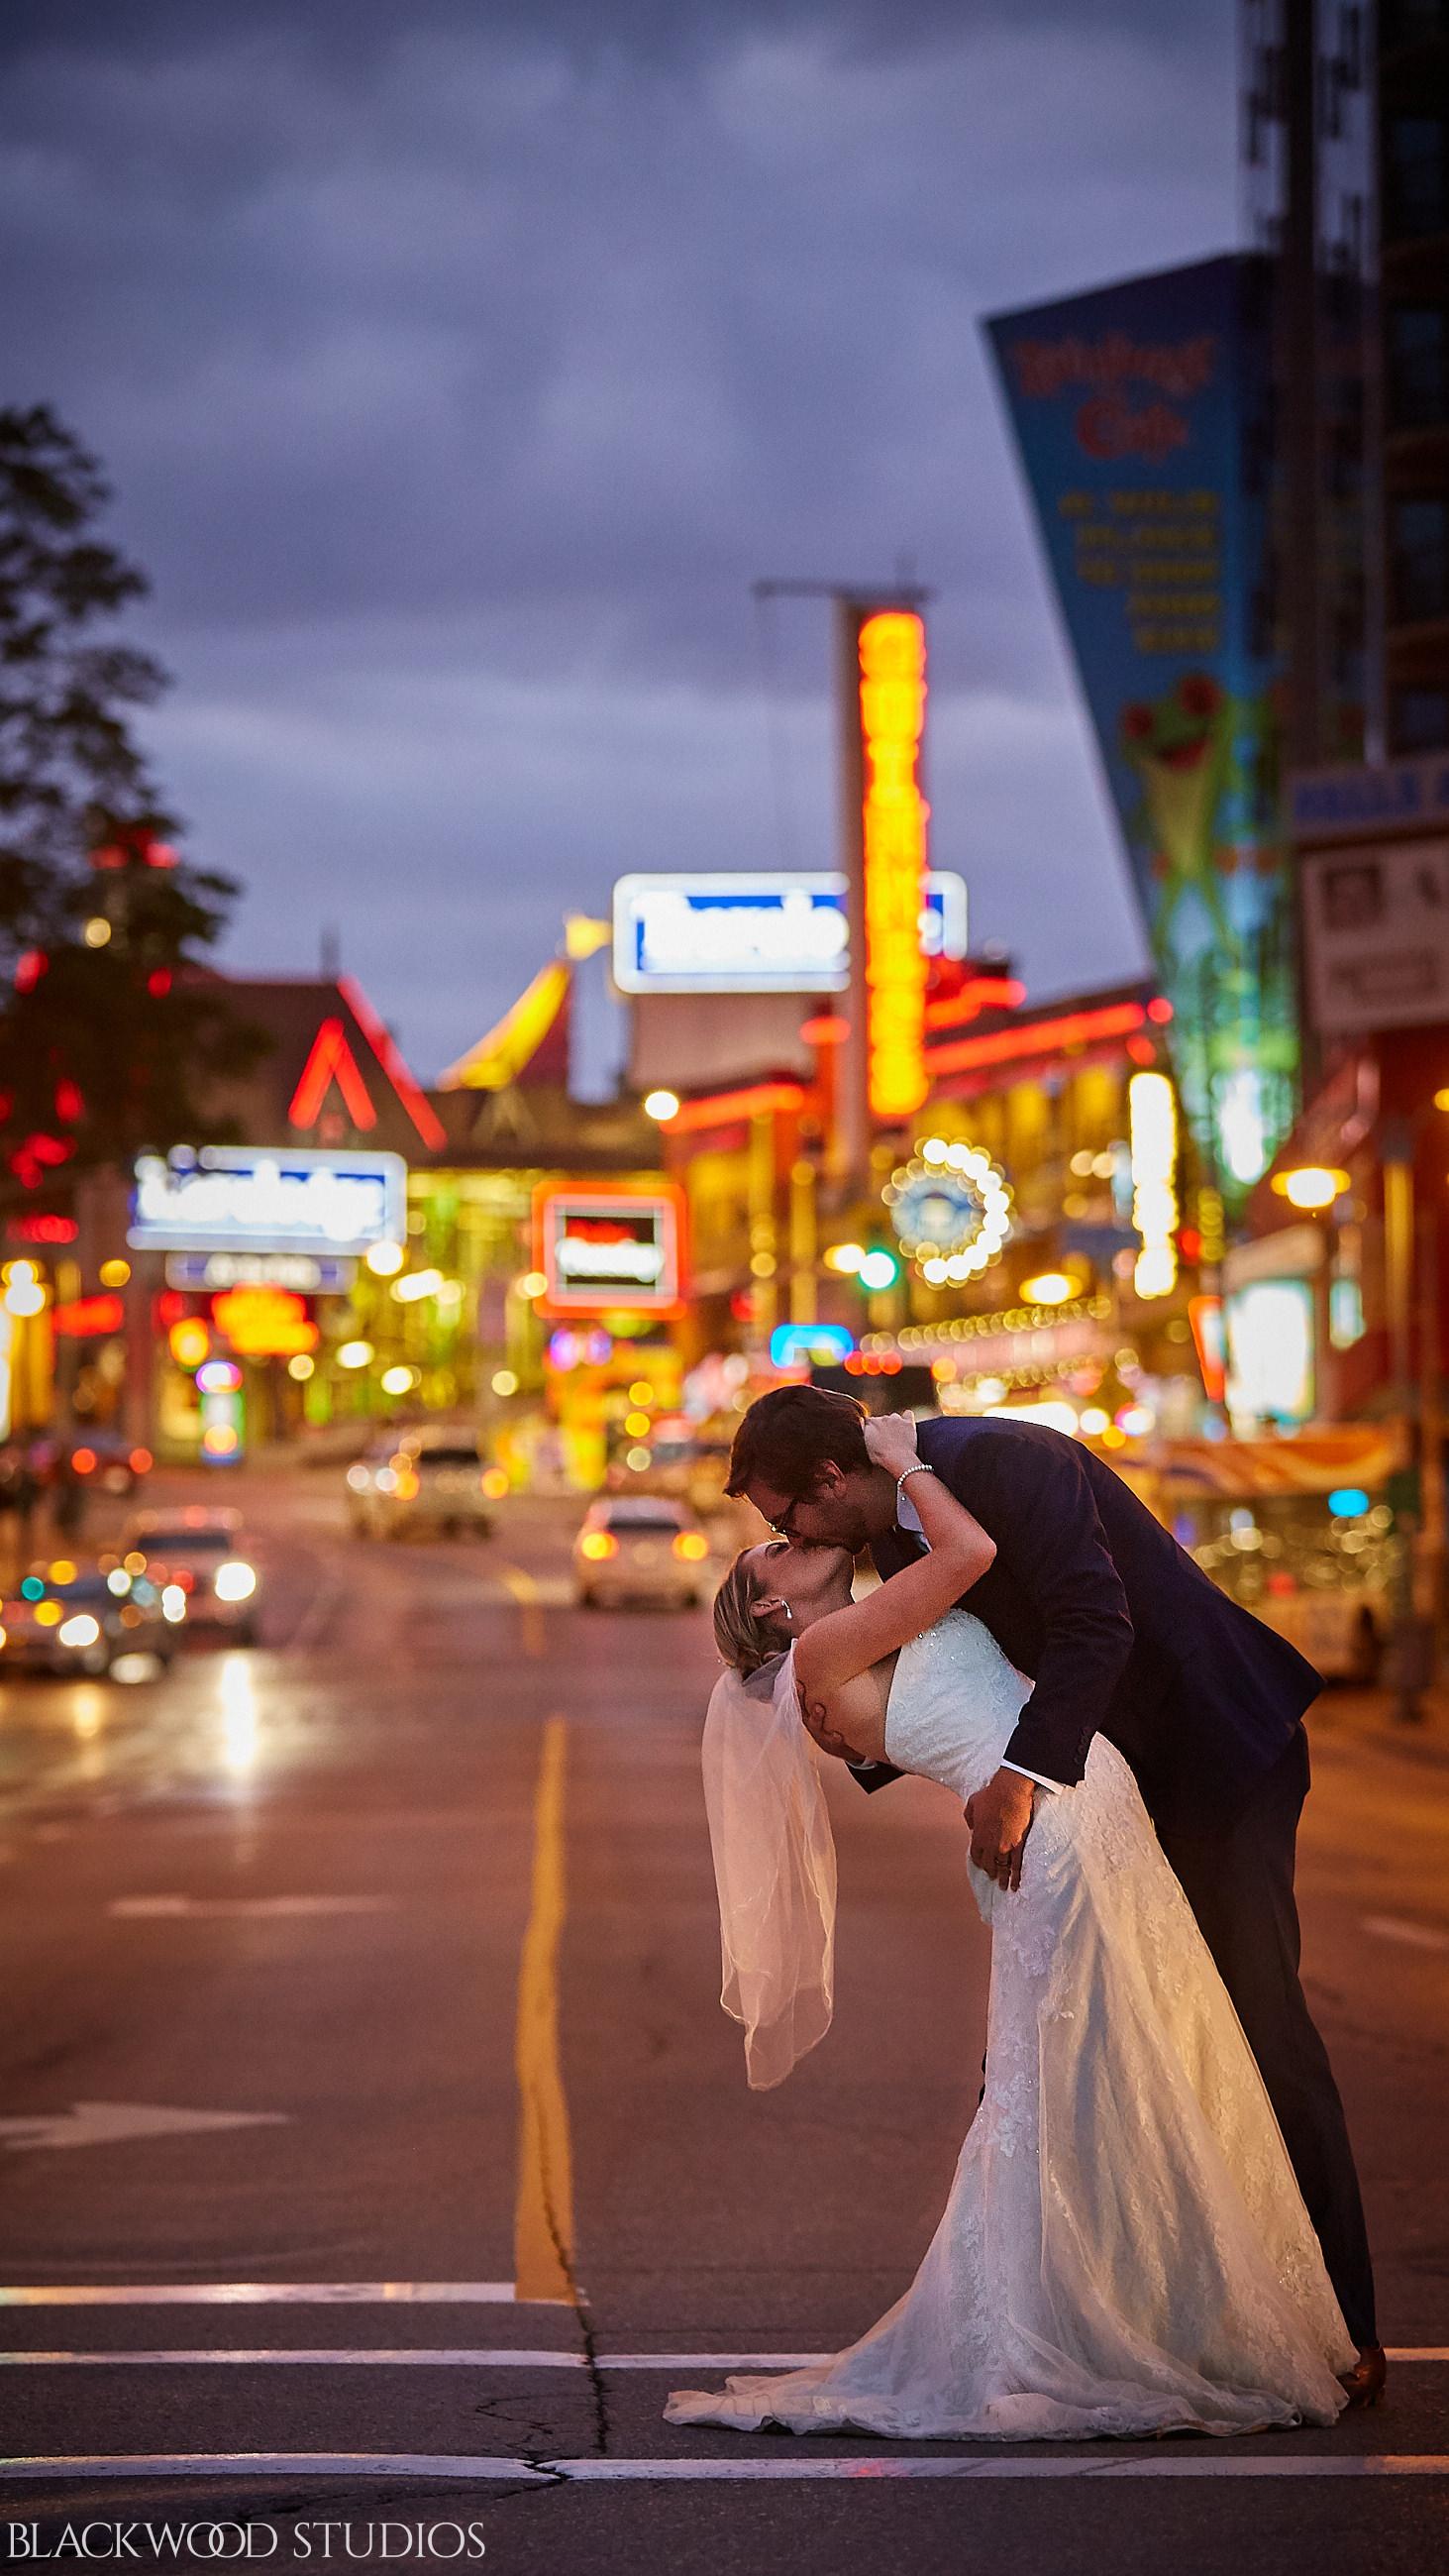 Blackwood-Studios-Wedding-Photography-20170928-191517-Marek-Katie-Michalek-Oakes-Garden-Theatre-Niagara-Falls-Ontario-Canada.jpg